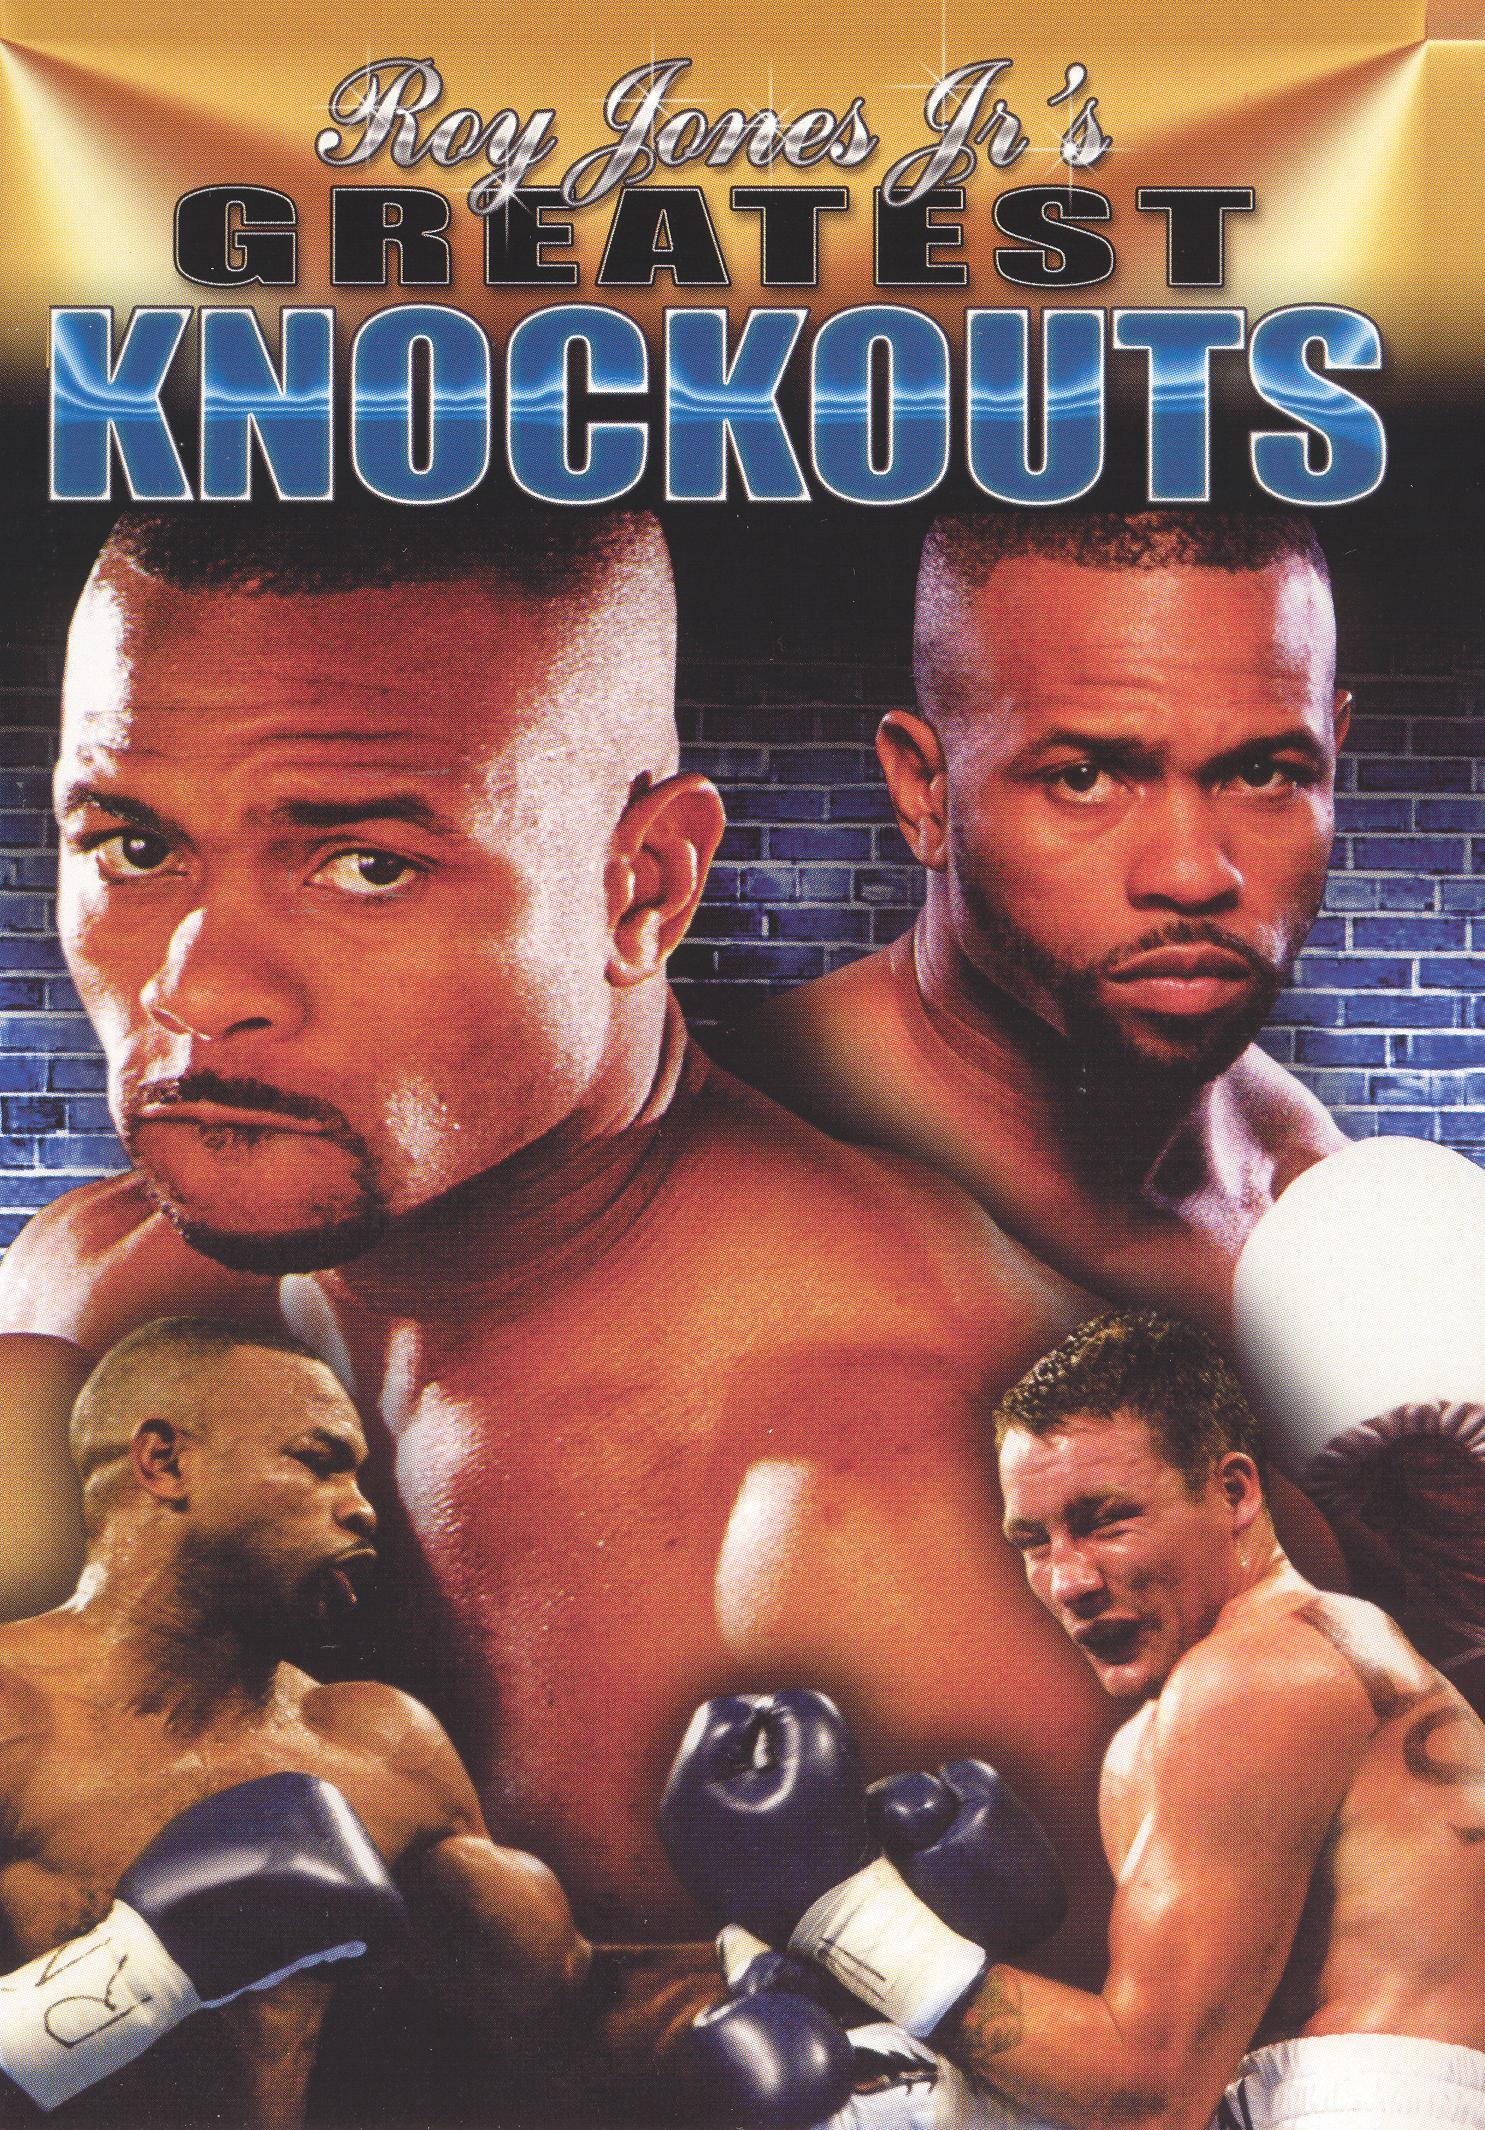 Roy Jones, Jr.'s Greatest Knockouts